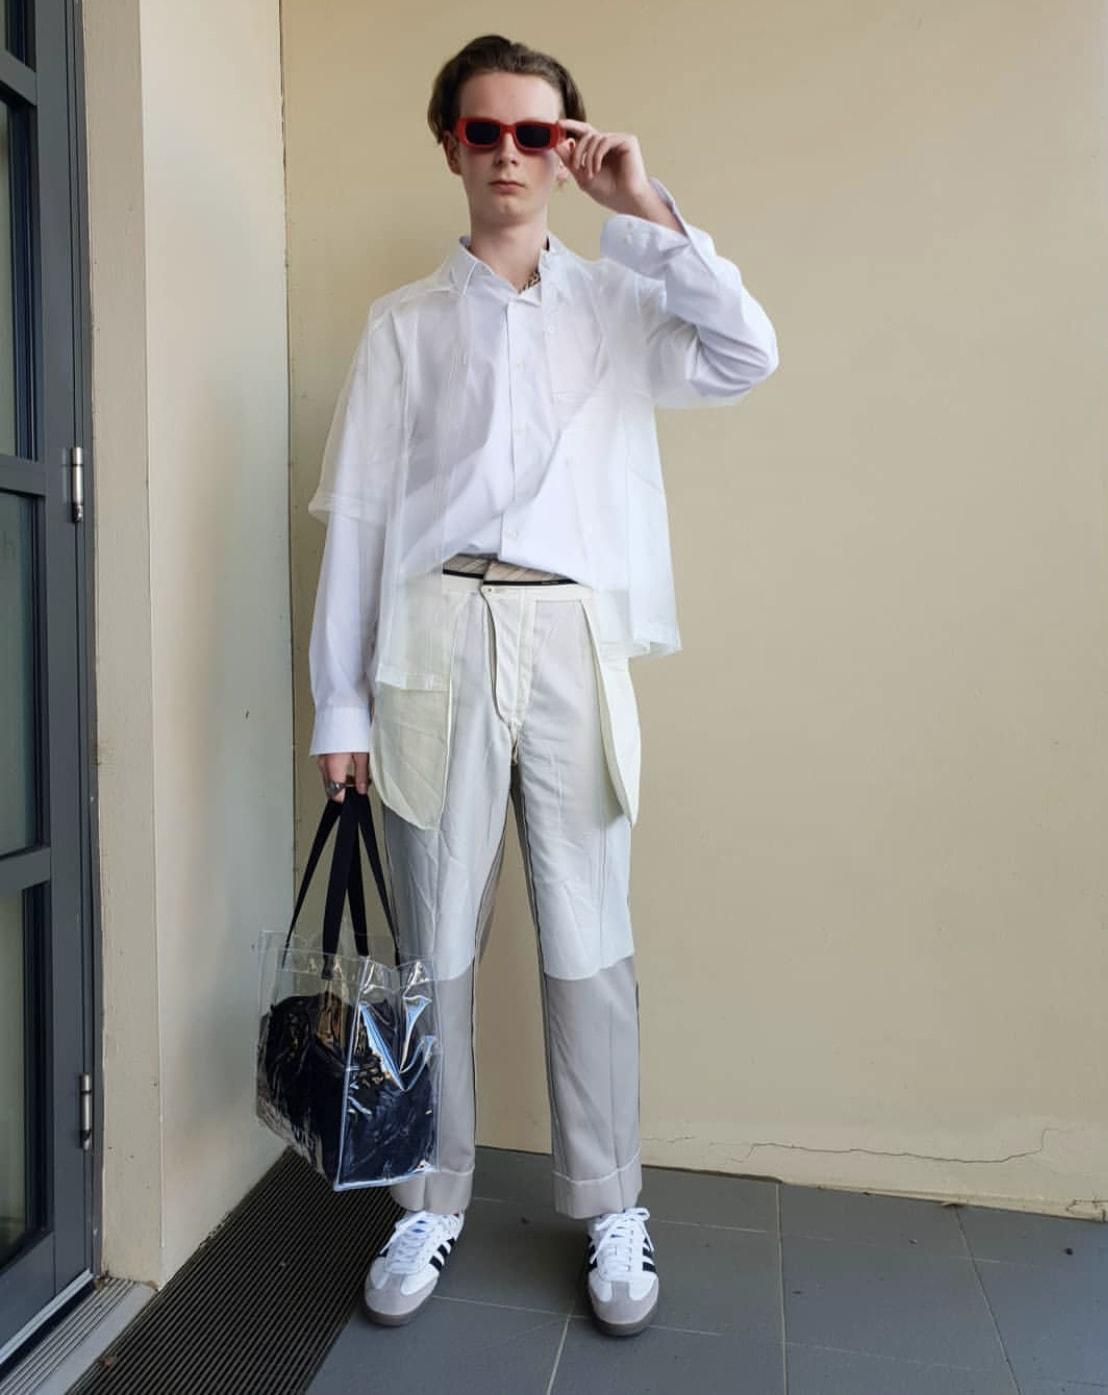 louieoblin stylish people instagram